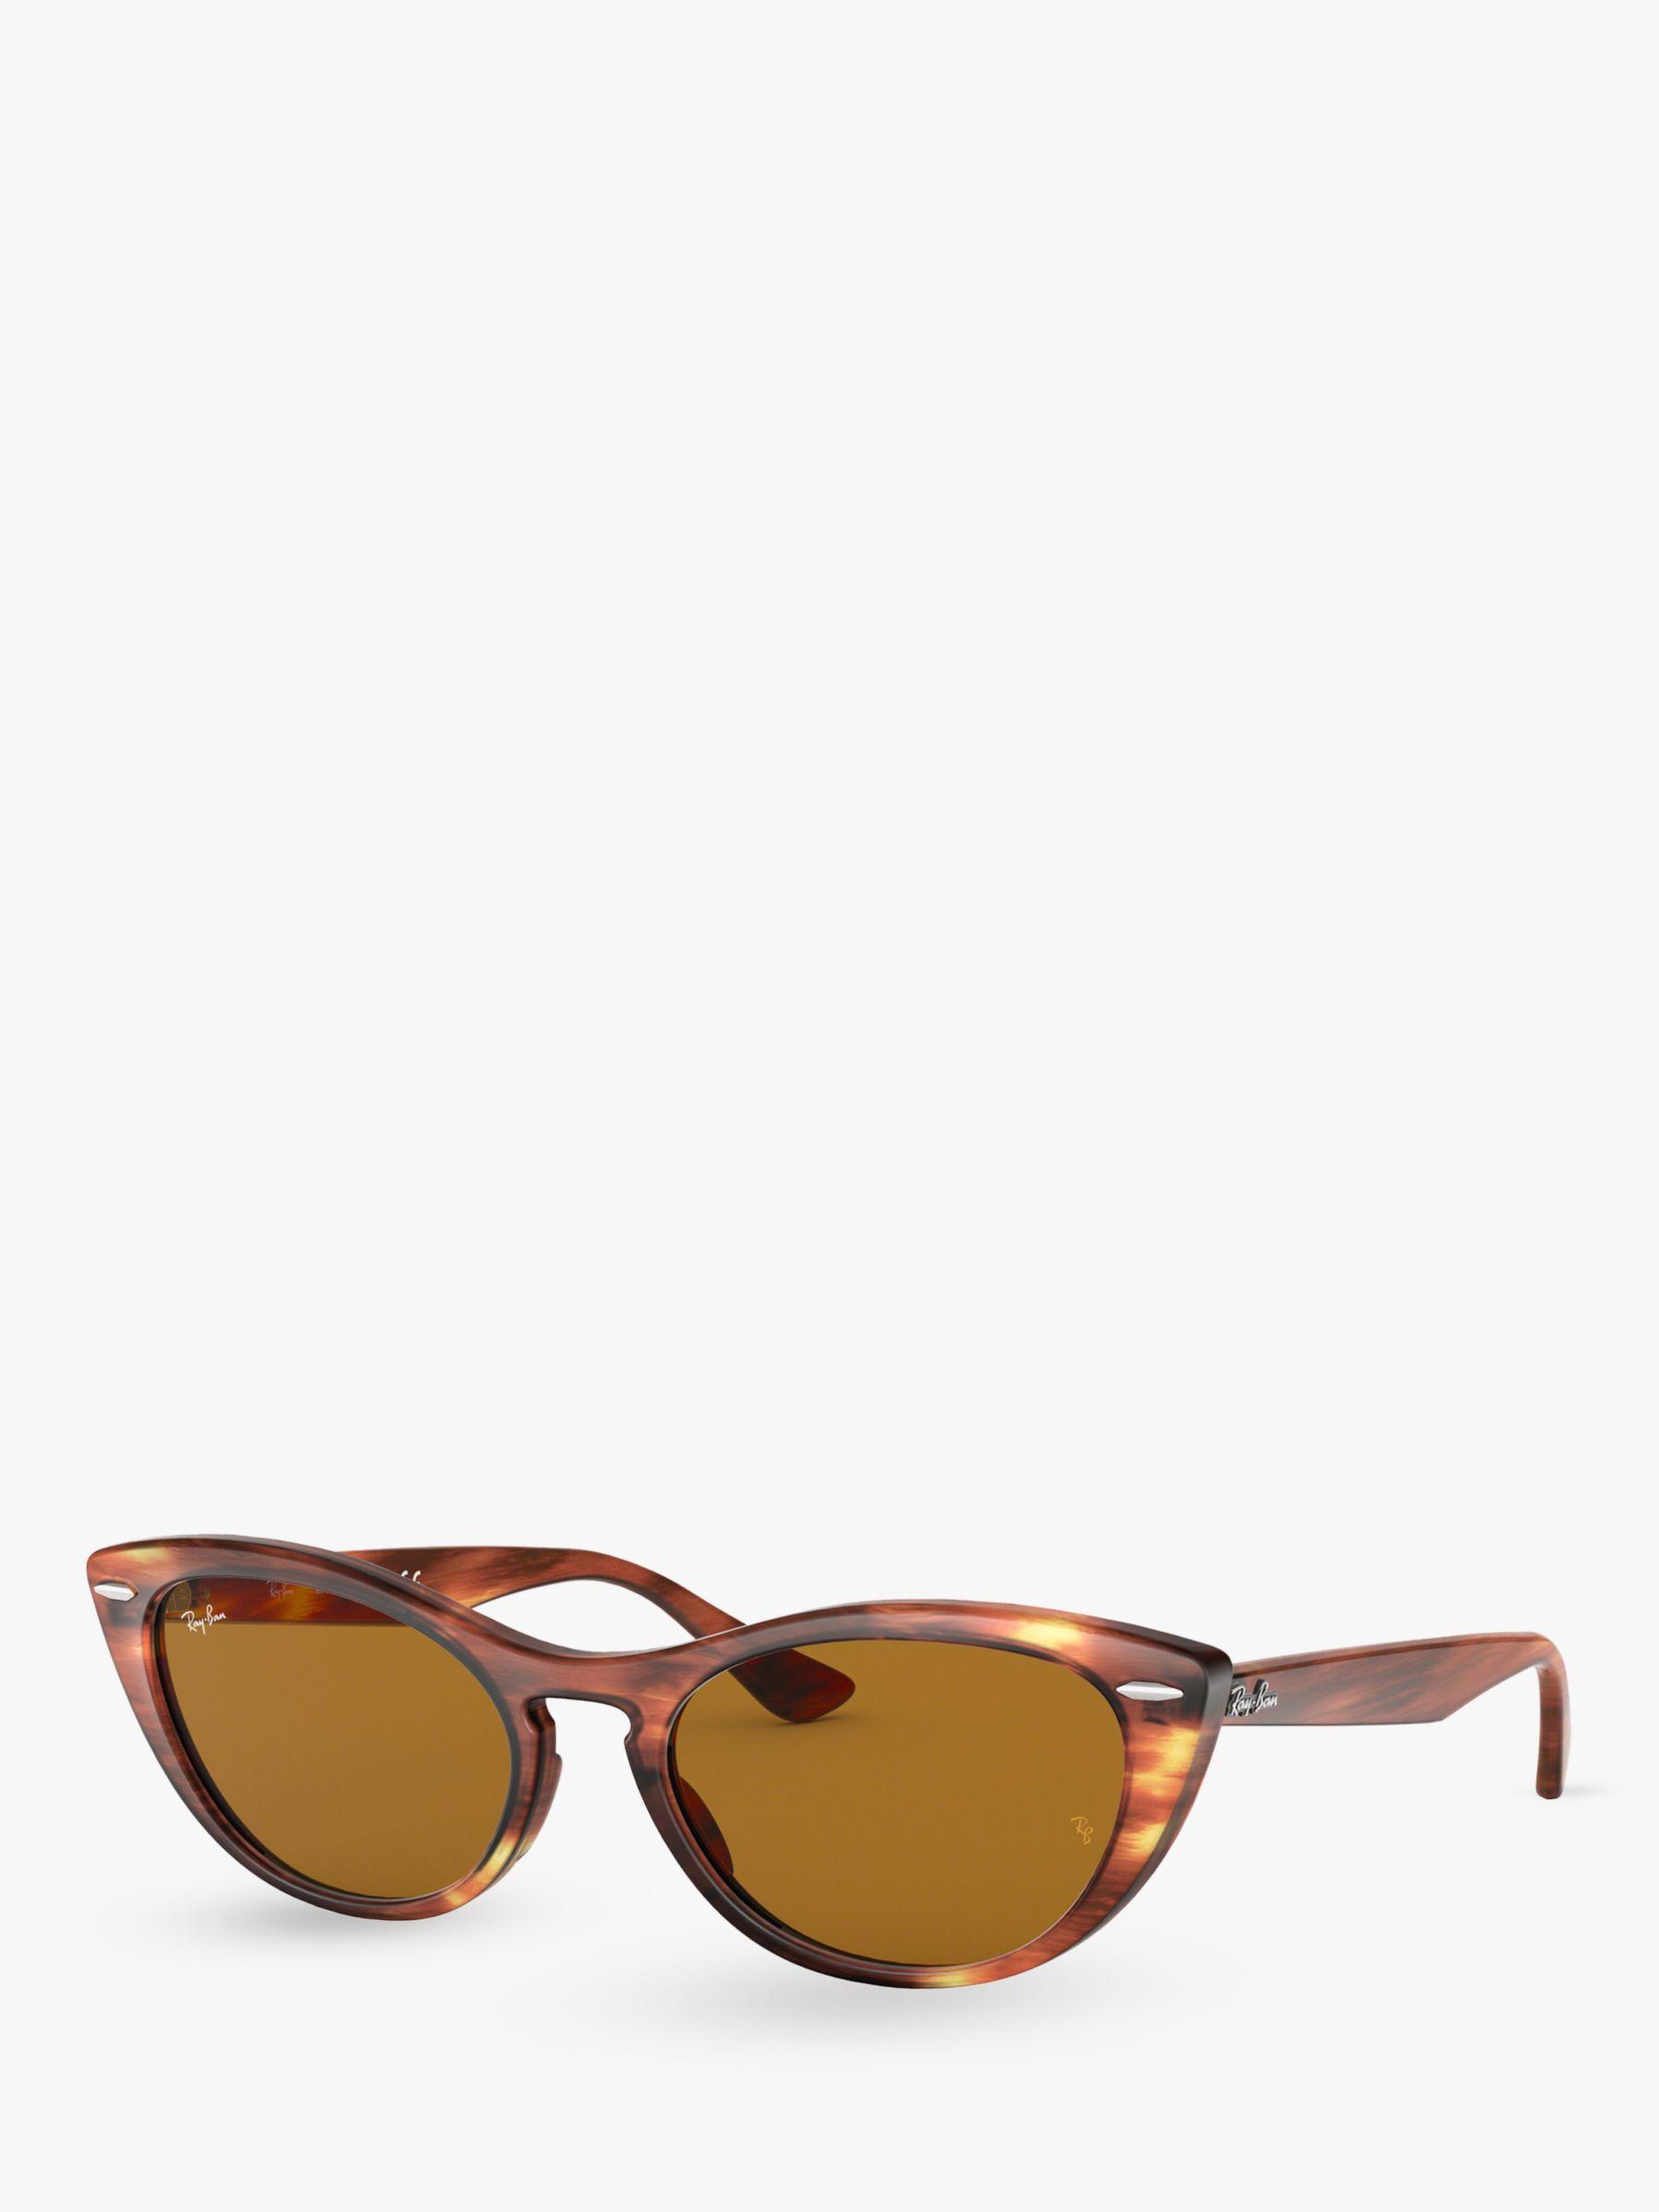 5c72c2388c ... switzerland ray ban rb4314n womens cats eye sunglasses tortoise brown  gradient at john lewis partners 5ca81